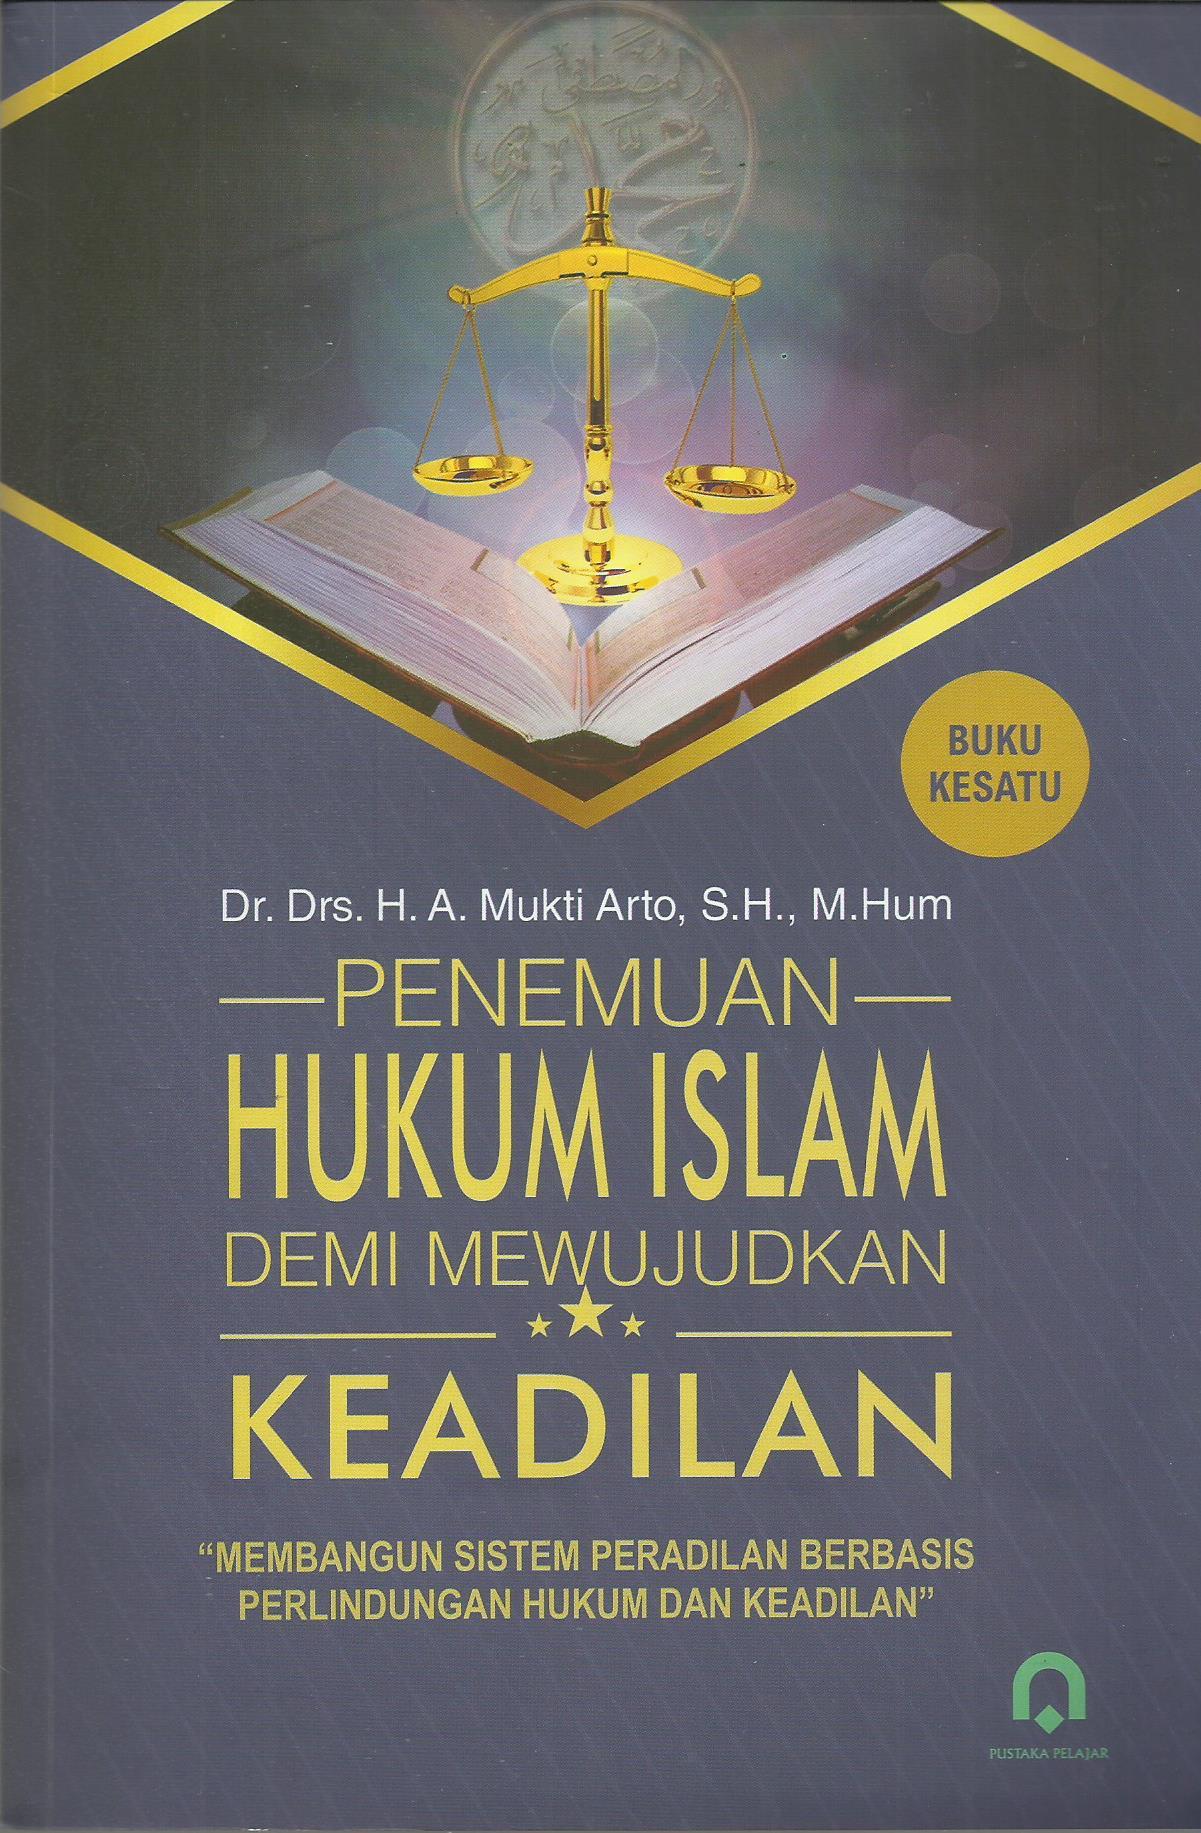 Penemuan Hukum Islam Demi Mewujudkan Keadilan Jl. 1